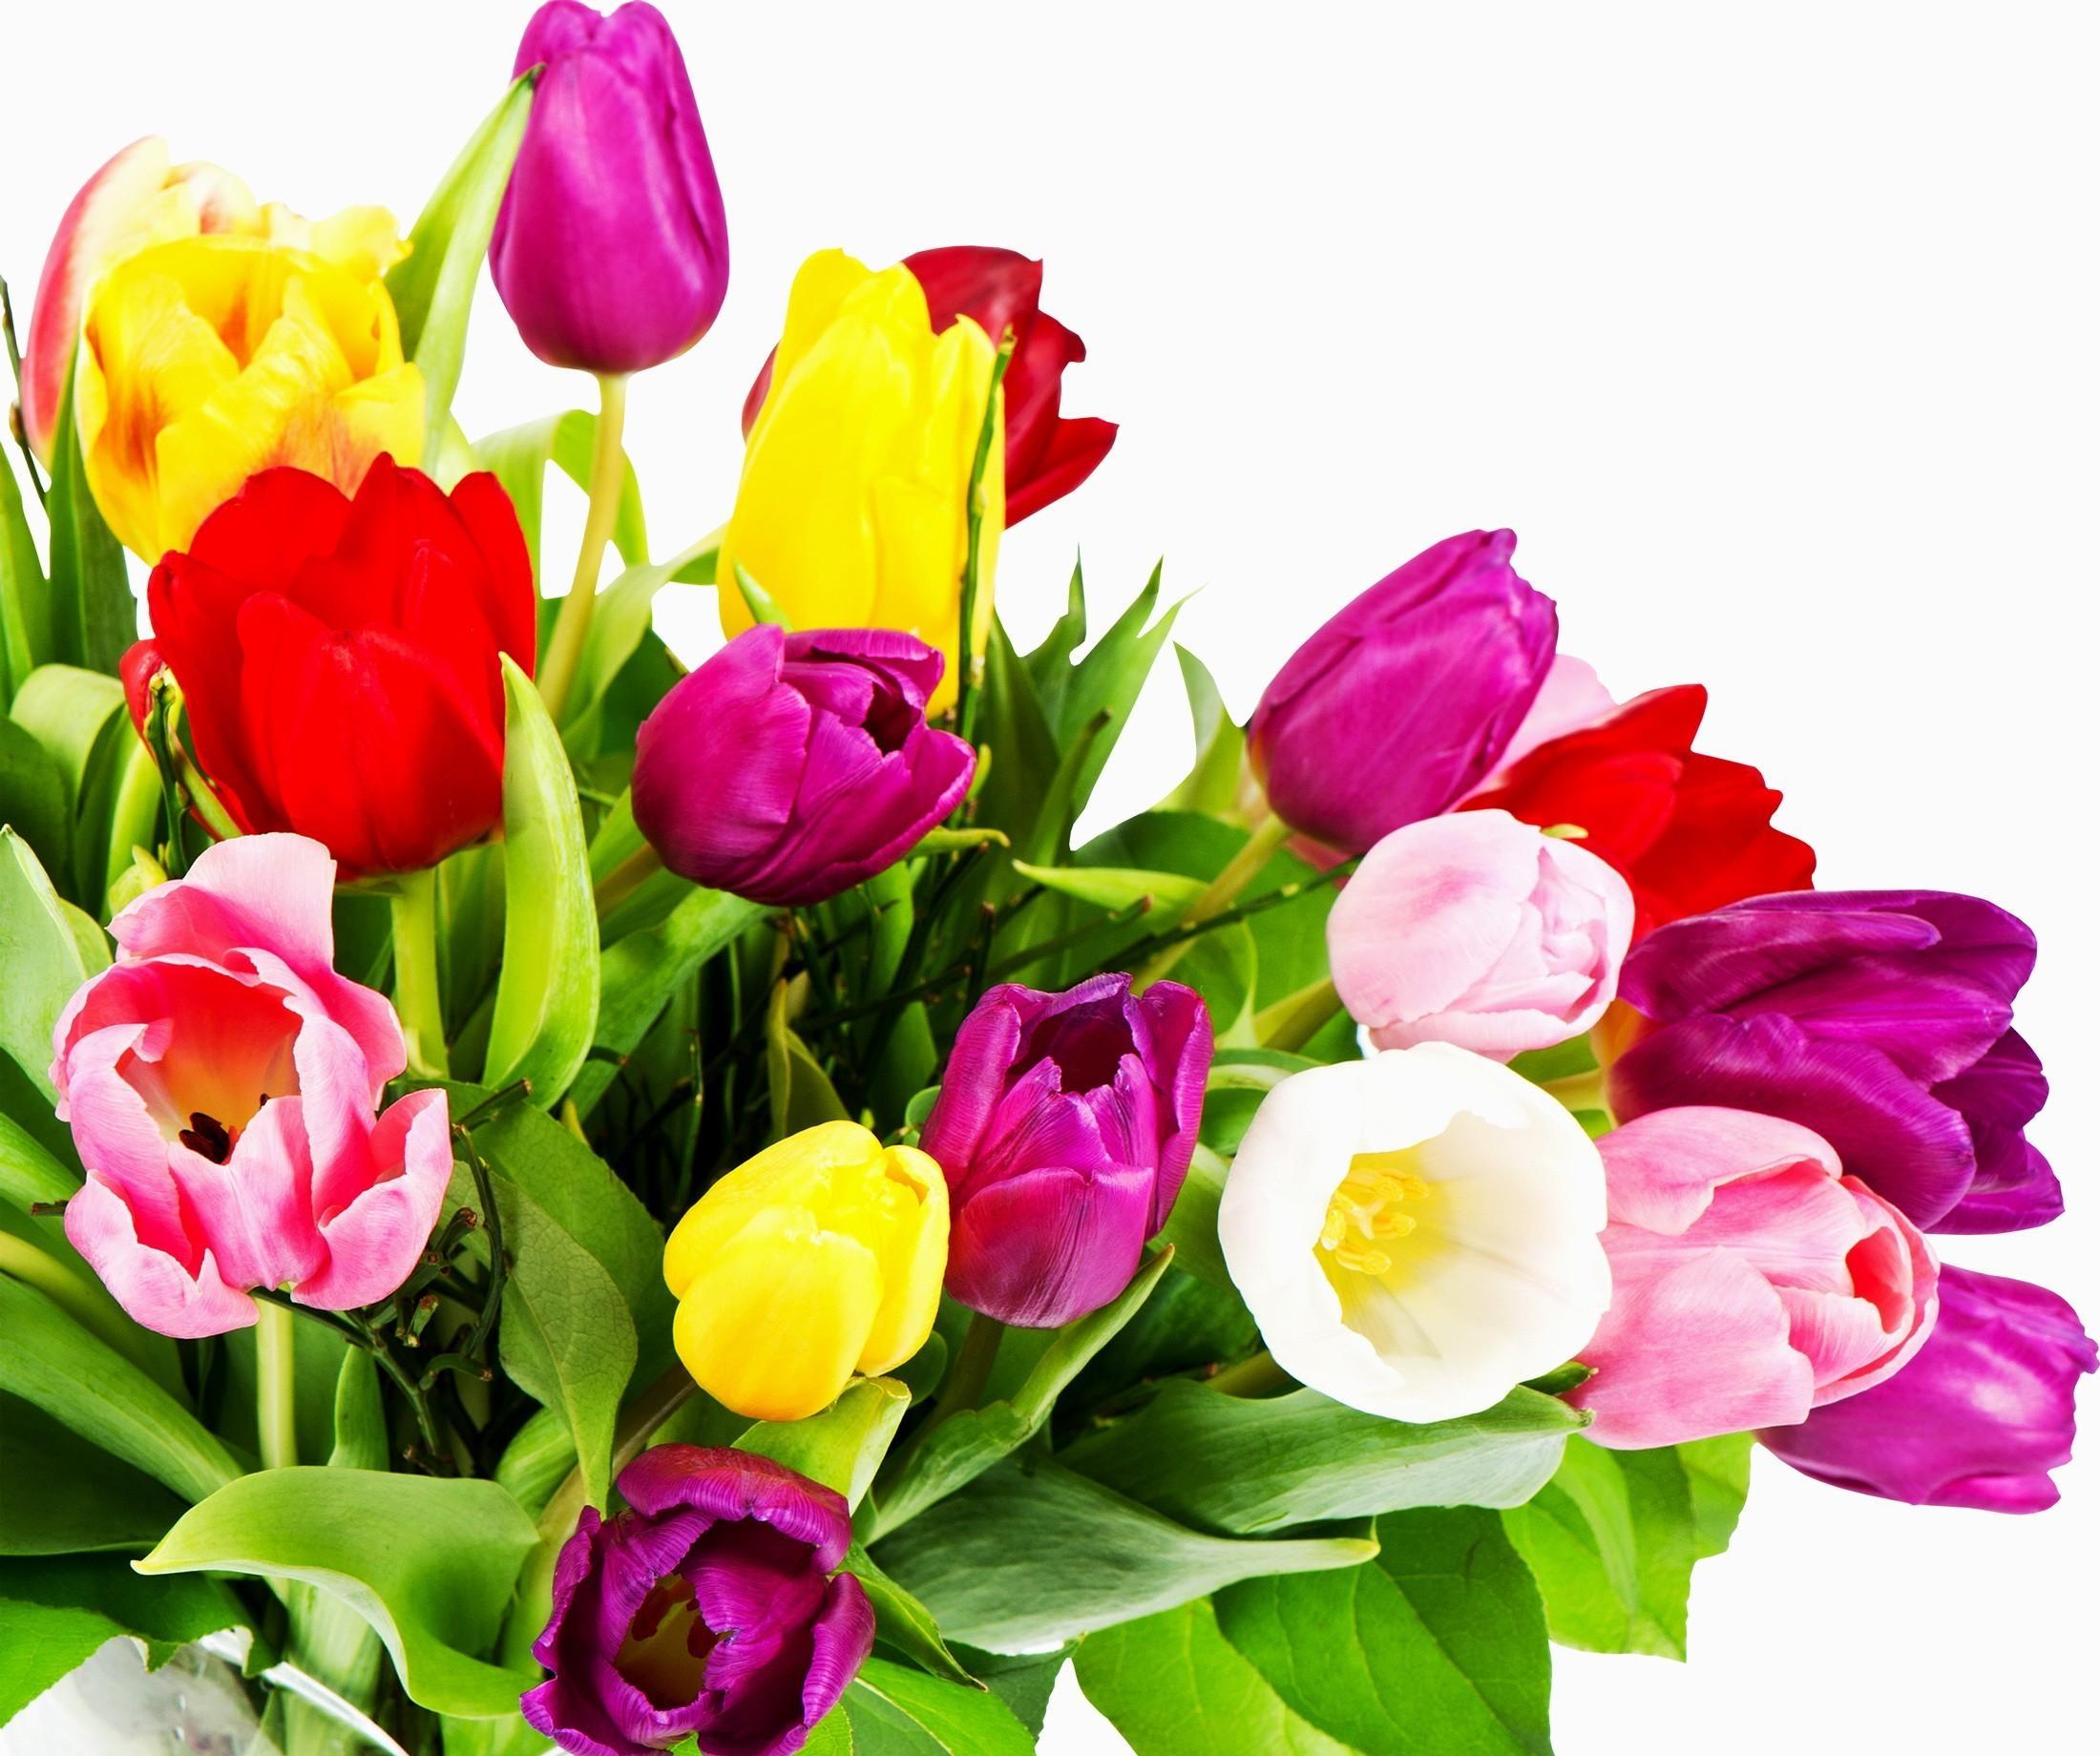 Wallpaper tulips flowers bouquet bright colorful white tulips flowers bouquet bright colorful white background izmirmasajfo